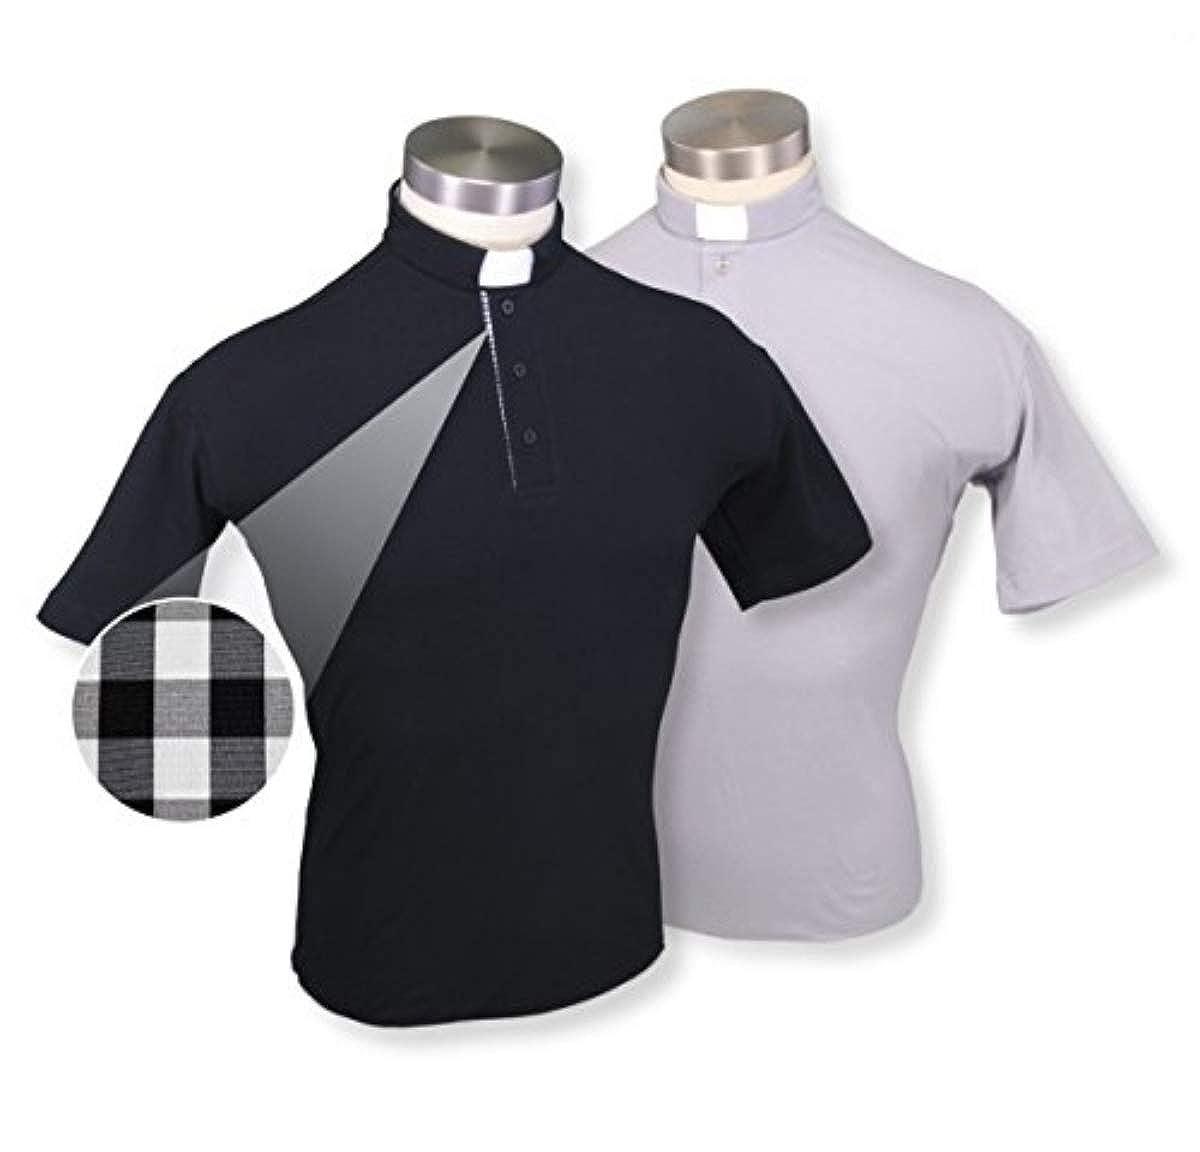 58bff6591 Liturgical Creations Mens European Cotton Short Sleeve Clergy Polo Shirt